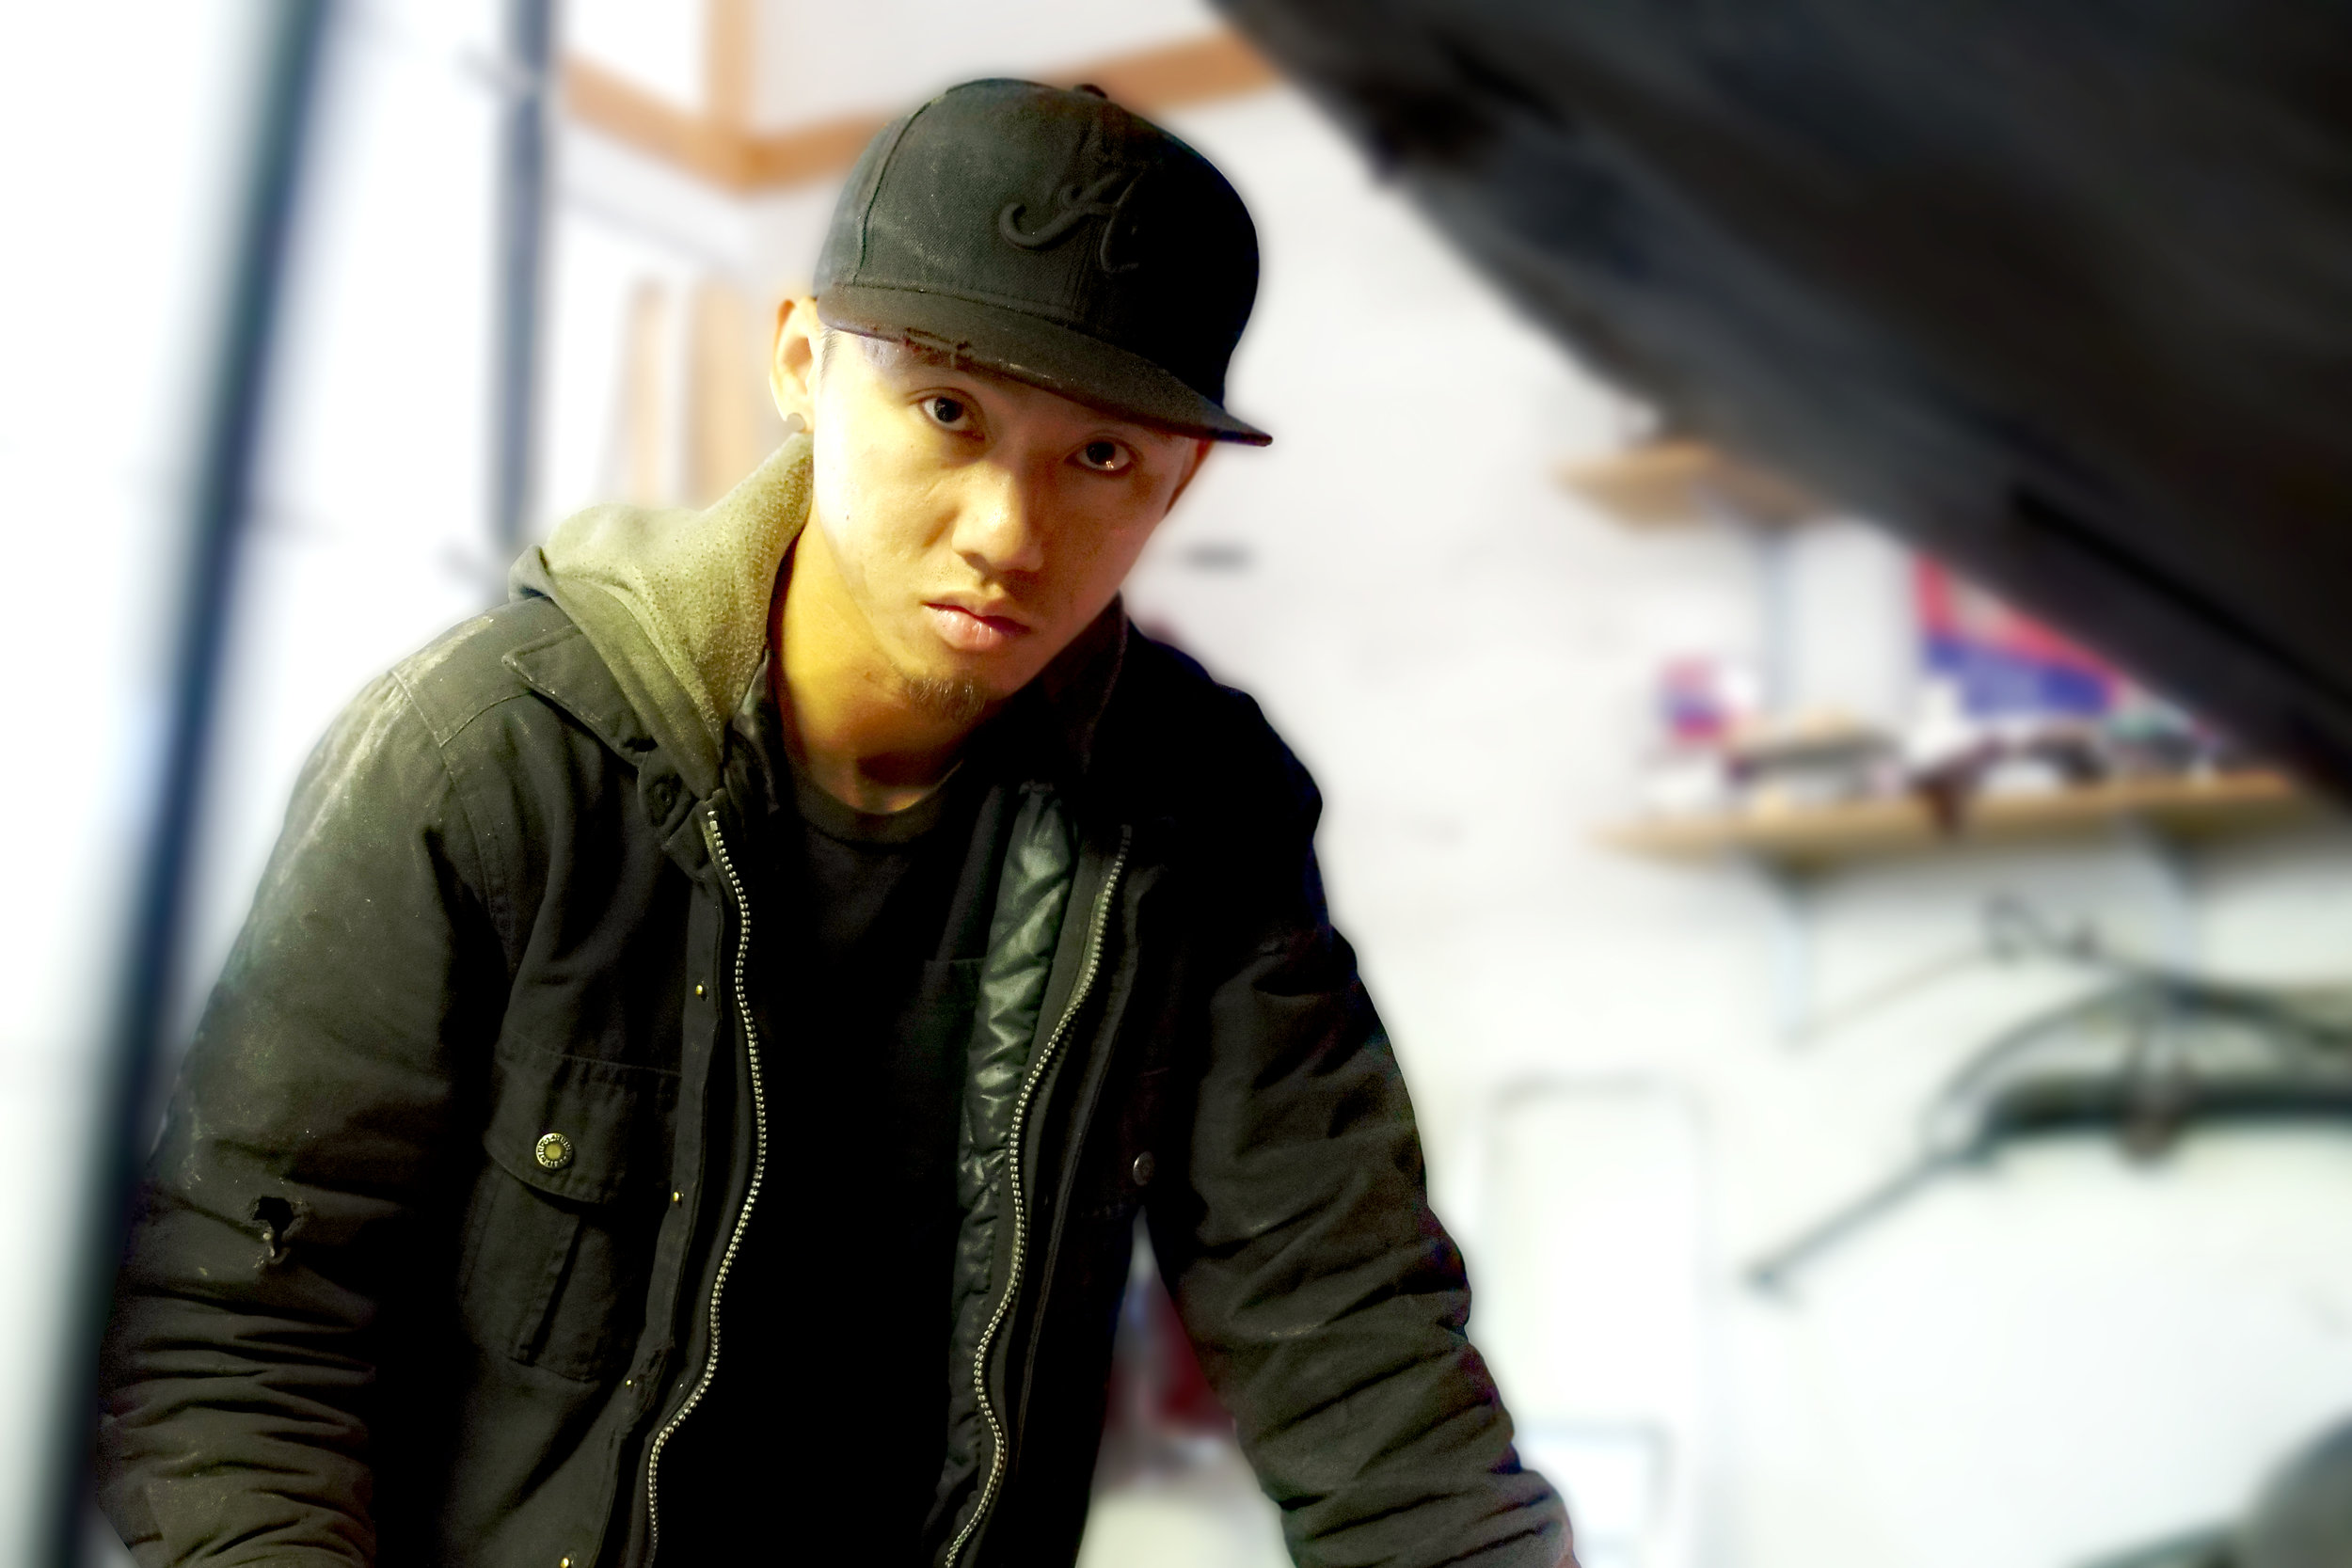 Fing Meng Yang